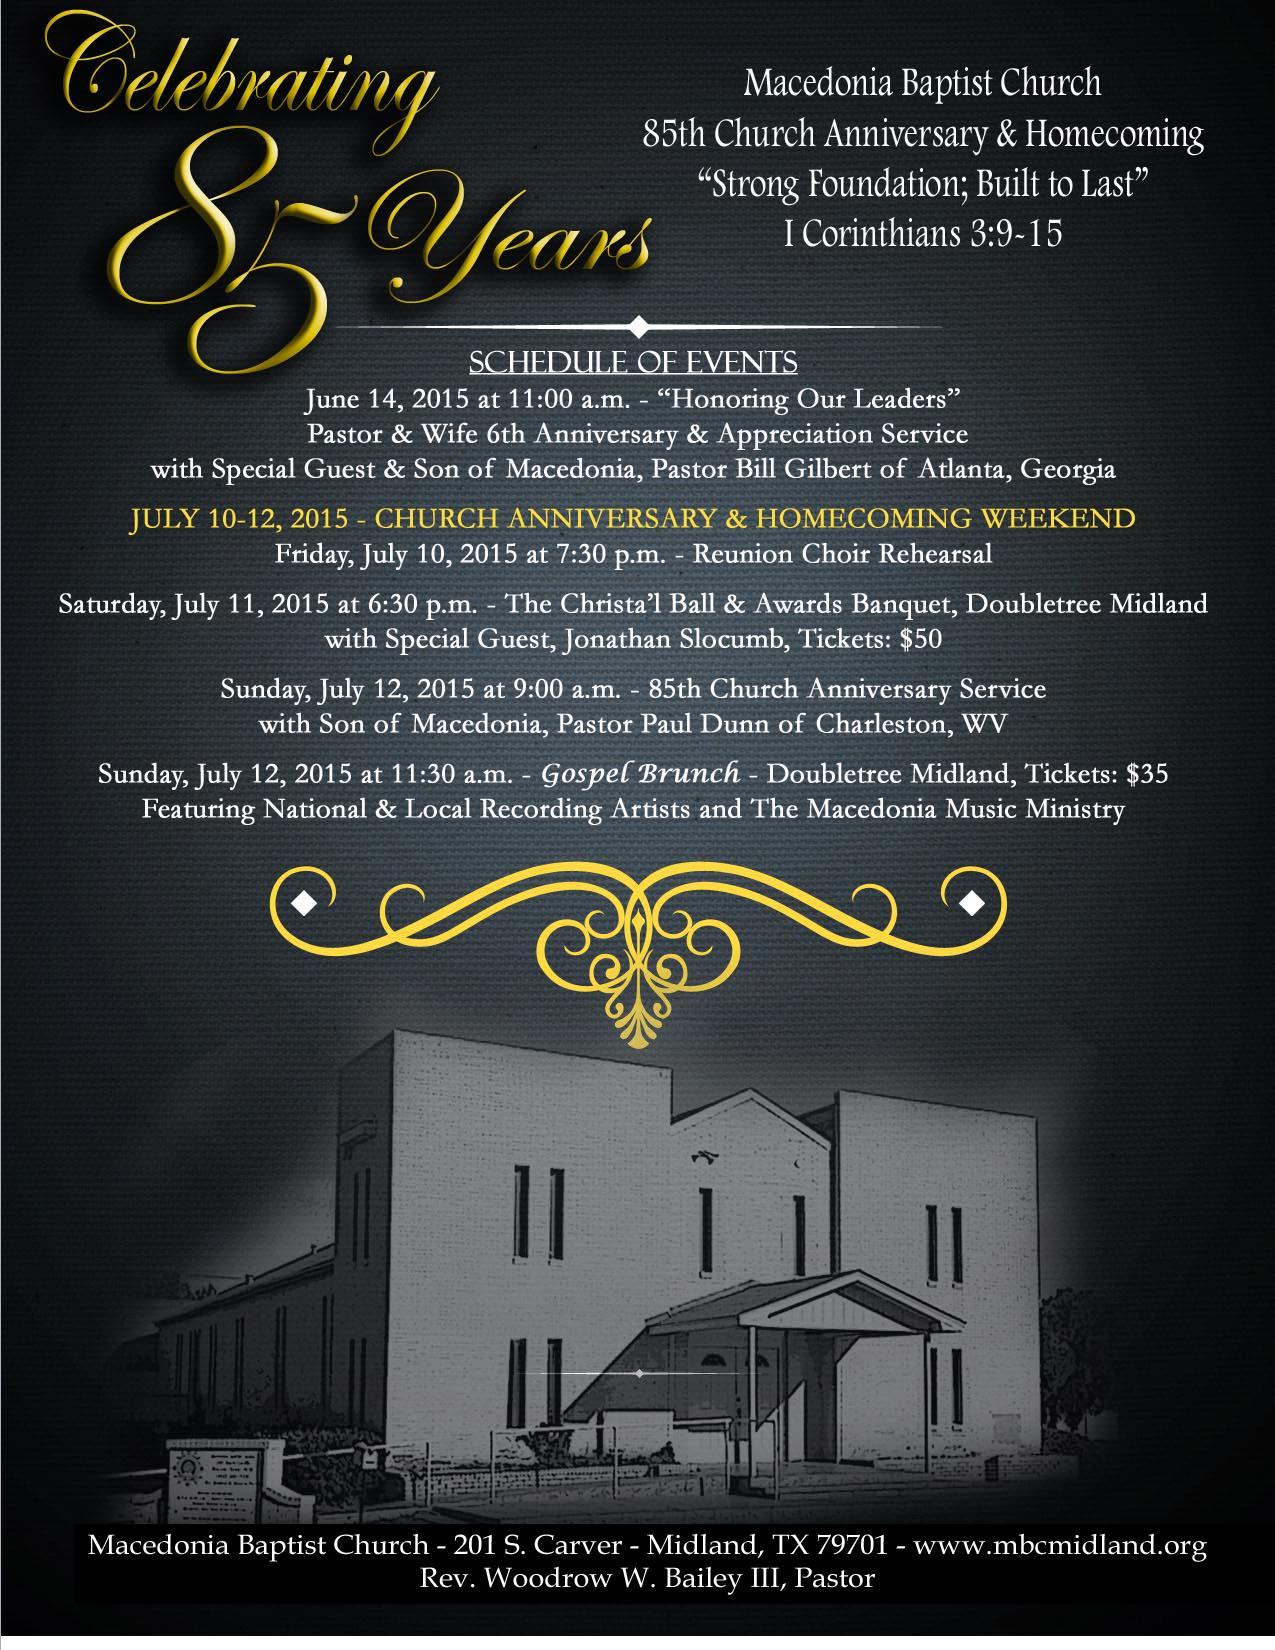 Church Anniversary Themes And Scriptures Macedonia baptist church ...